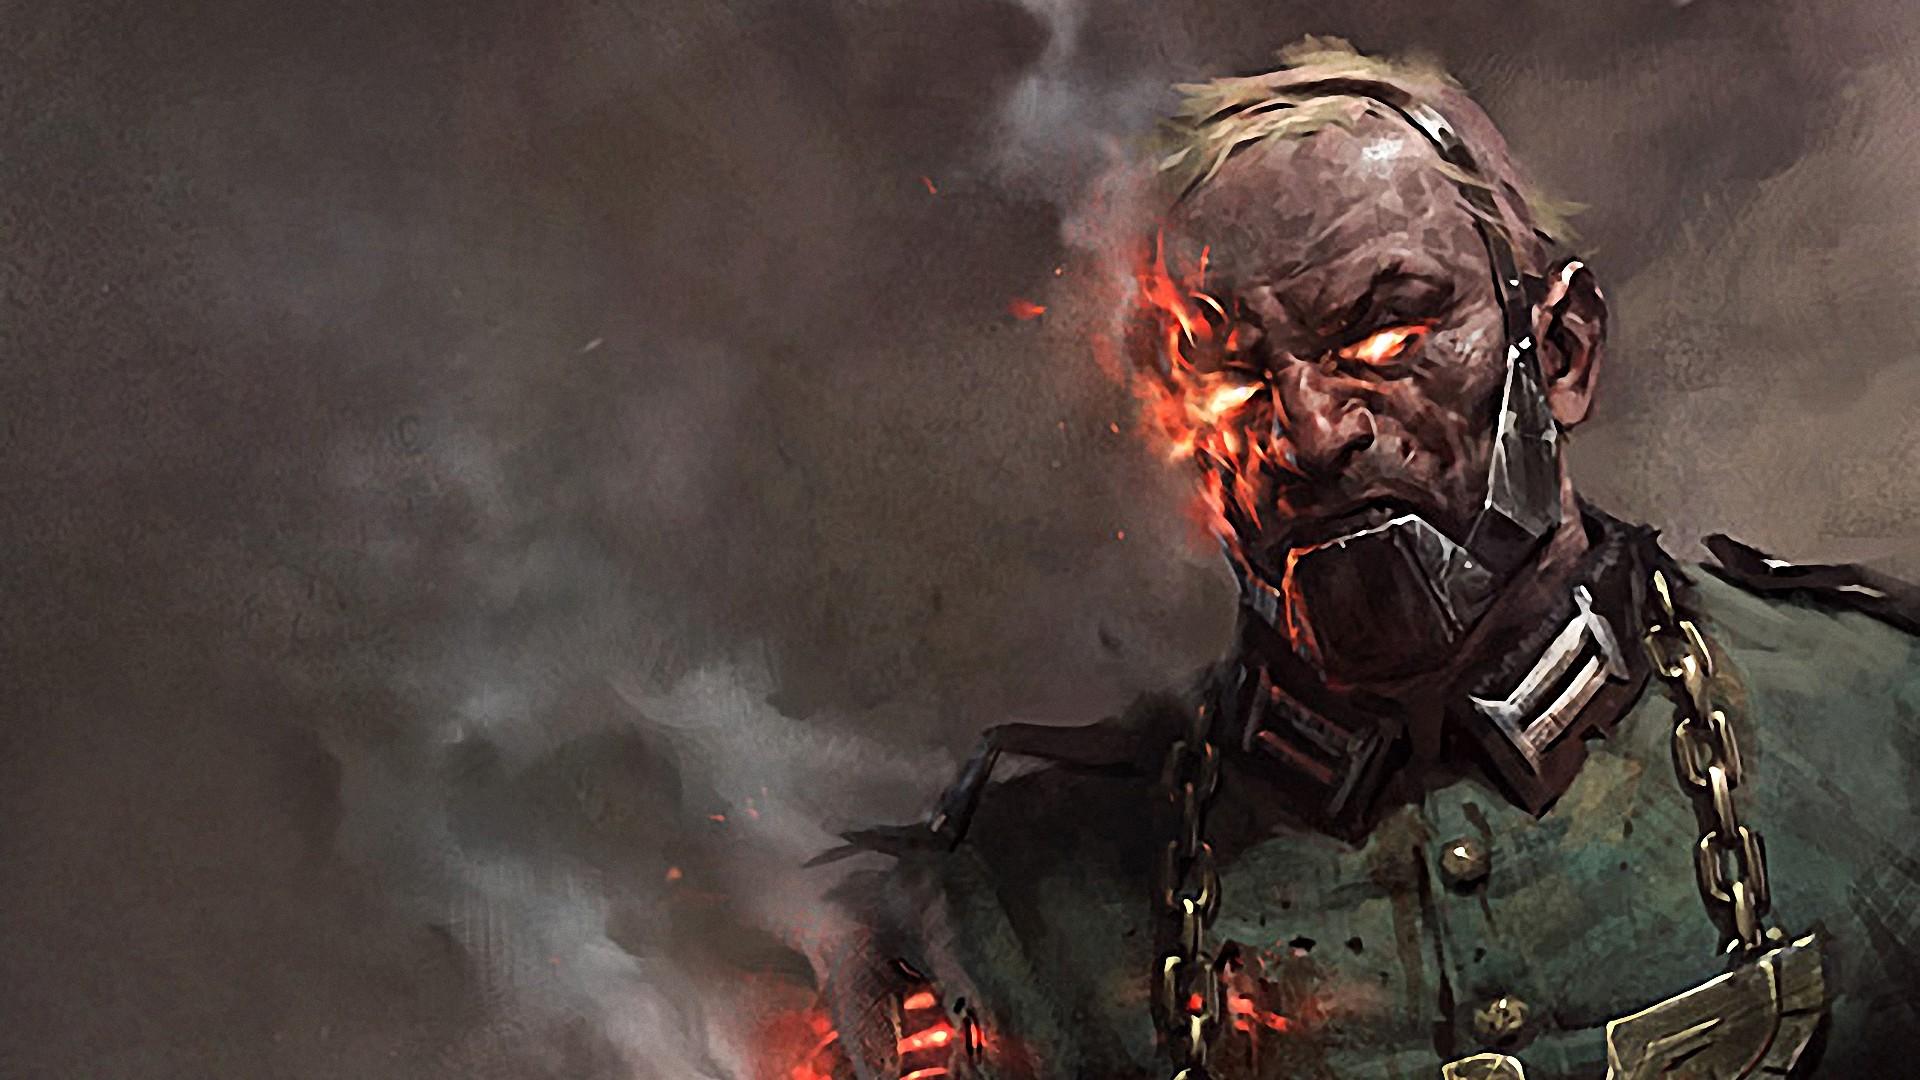 Zombies Nazi artwork wallpaper 1920x1080 192041 WallpaperUP 1920x1080